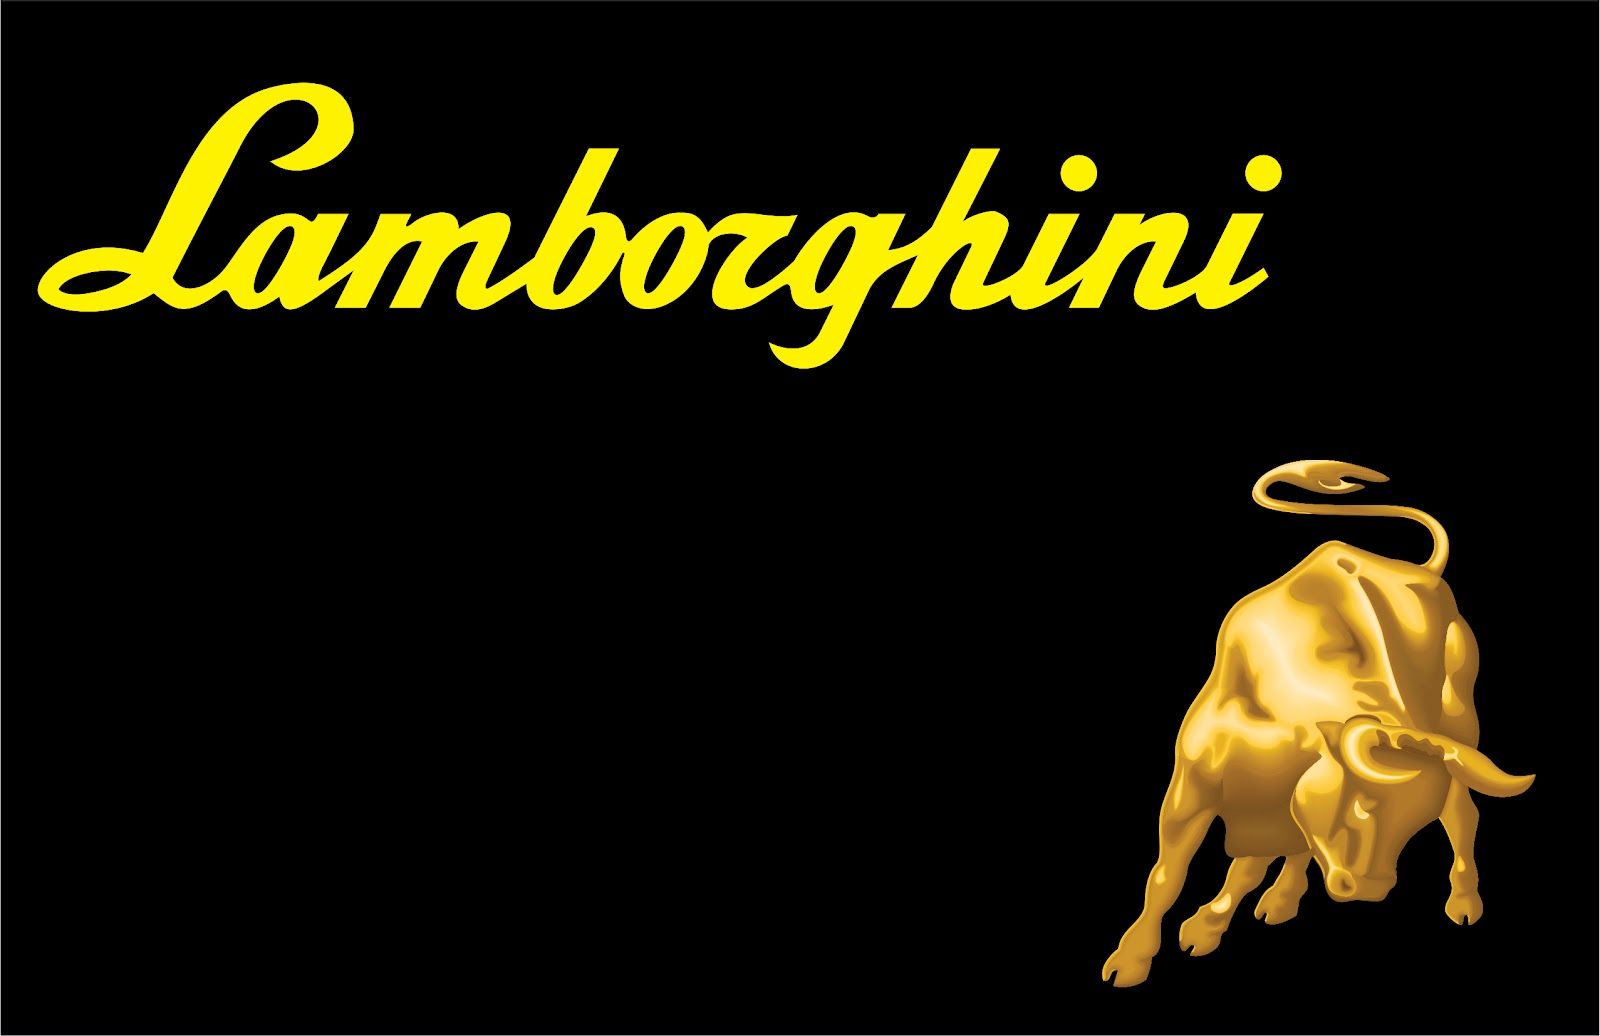 lamborghini logo wallpaper hd wallpapers jpg - Lamborghini Logo Wallpaper Iphone